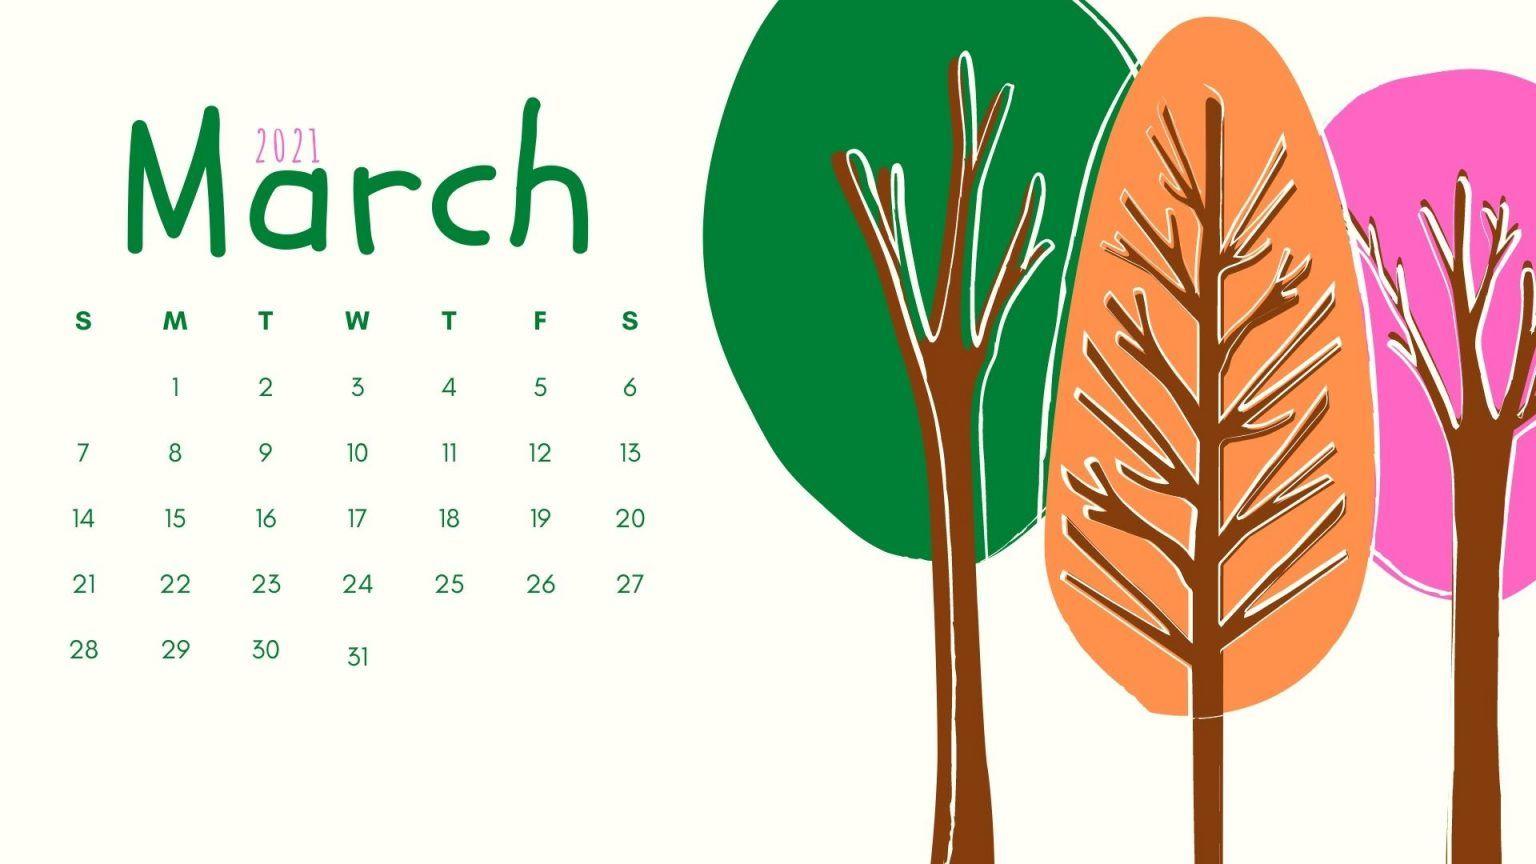 Classy March 2021 Calendar Wallpaper